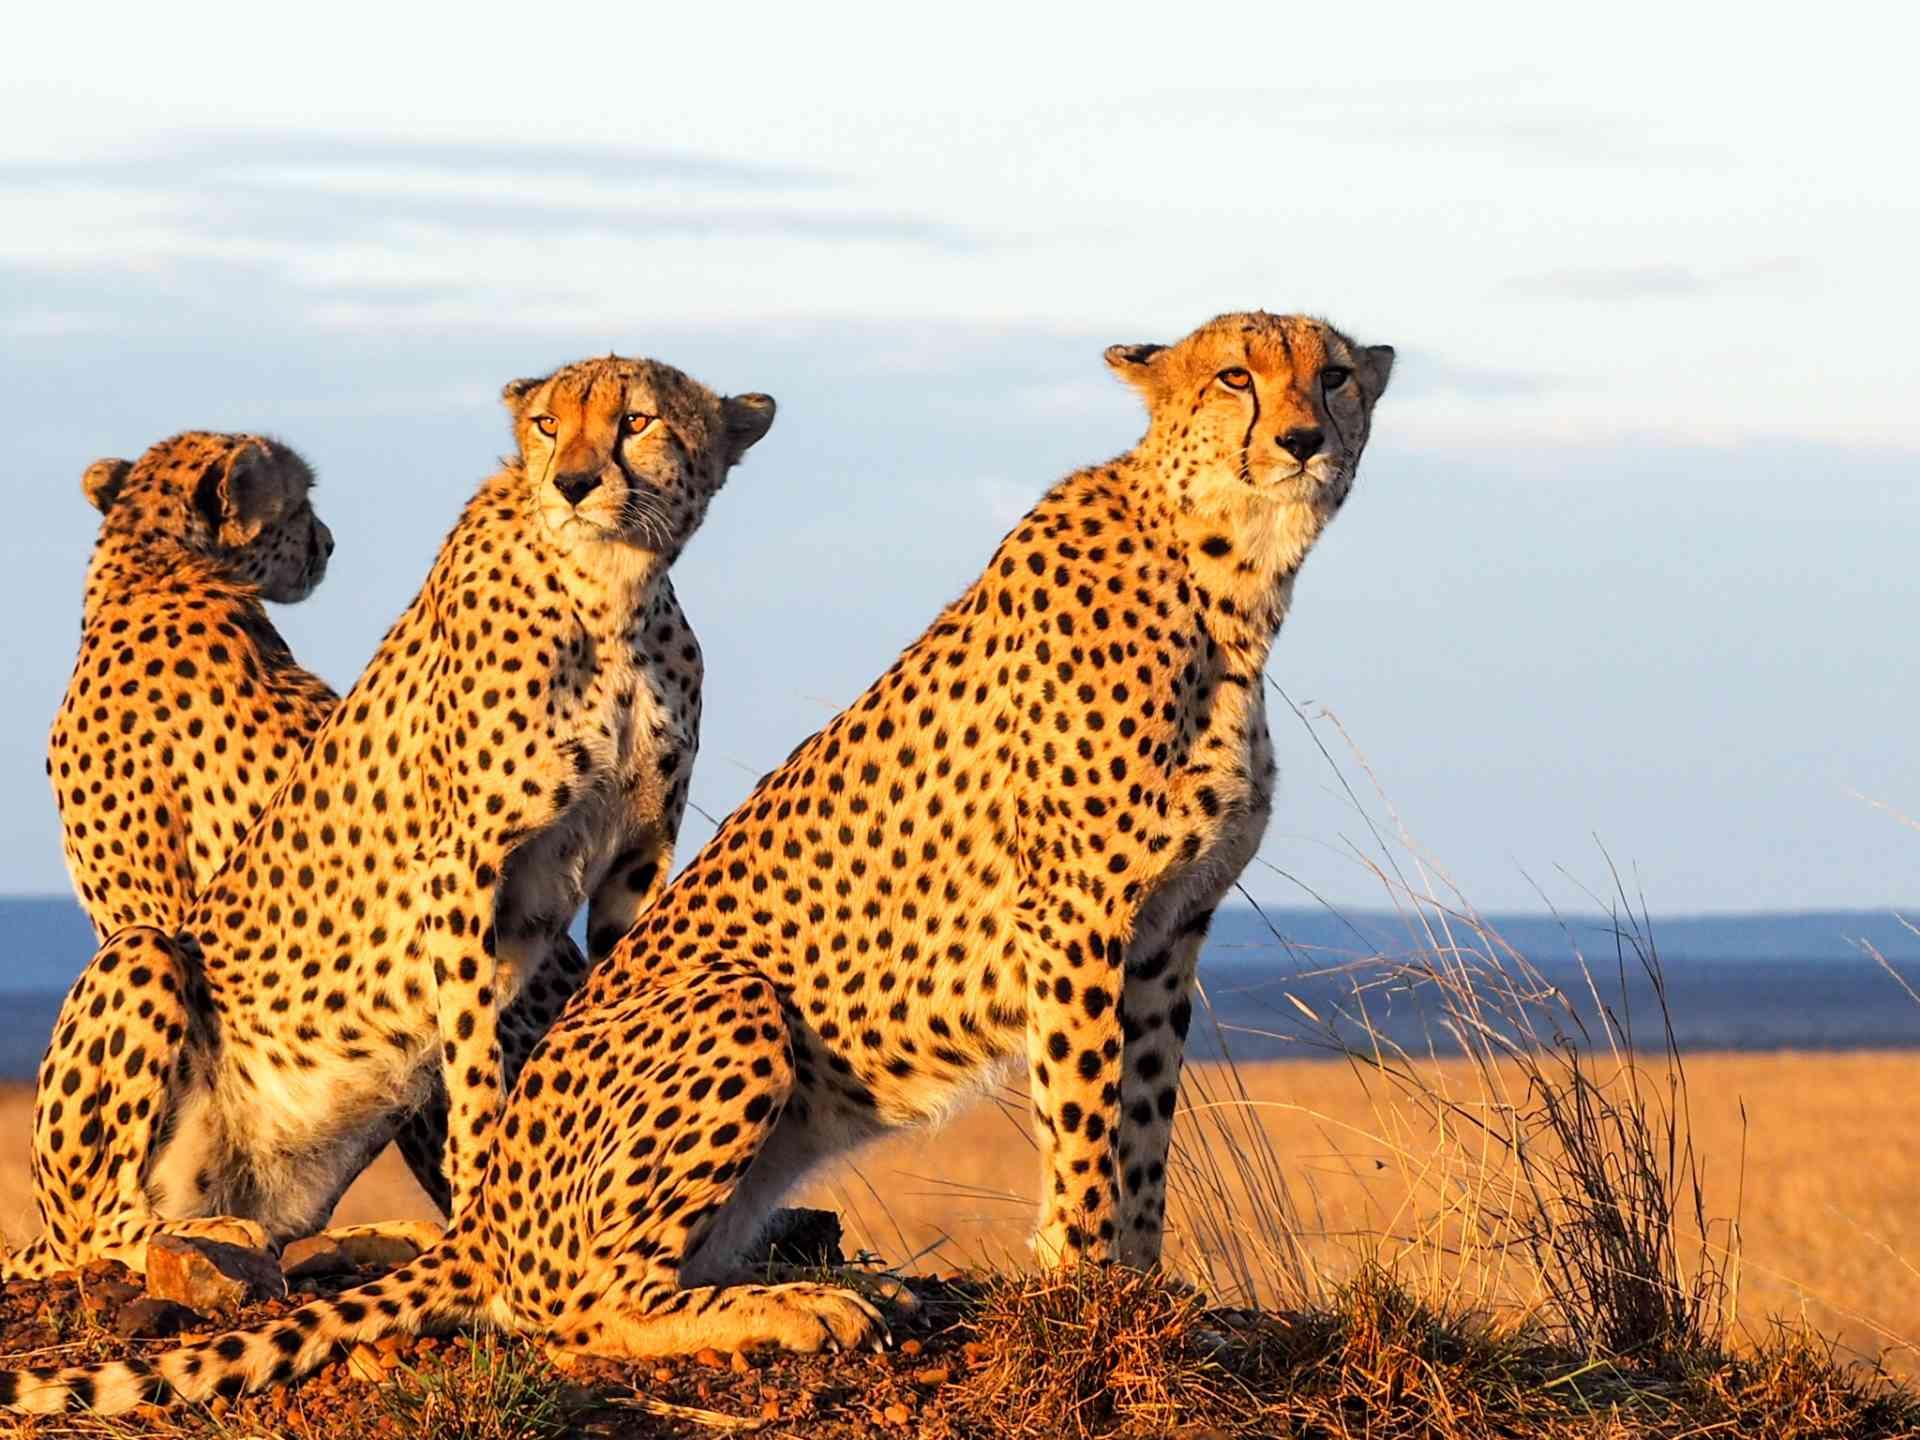 Cheetahs, Maasai Mara, Kenya by Emily Fraser